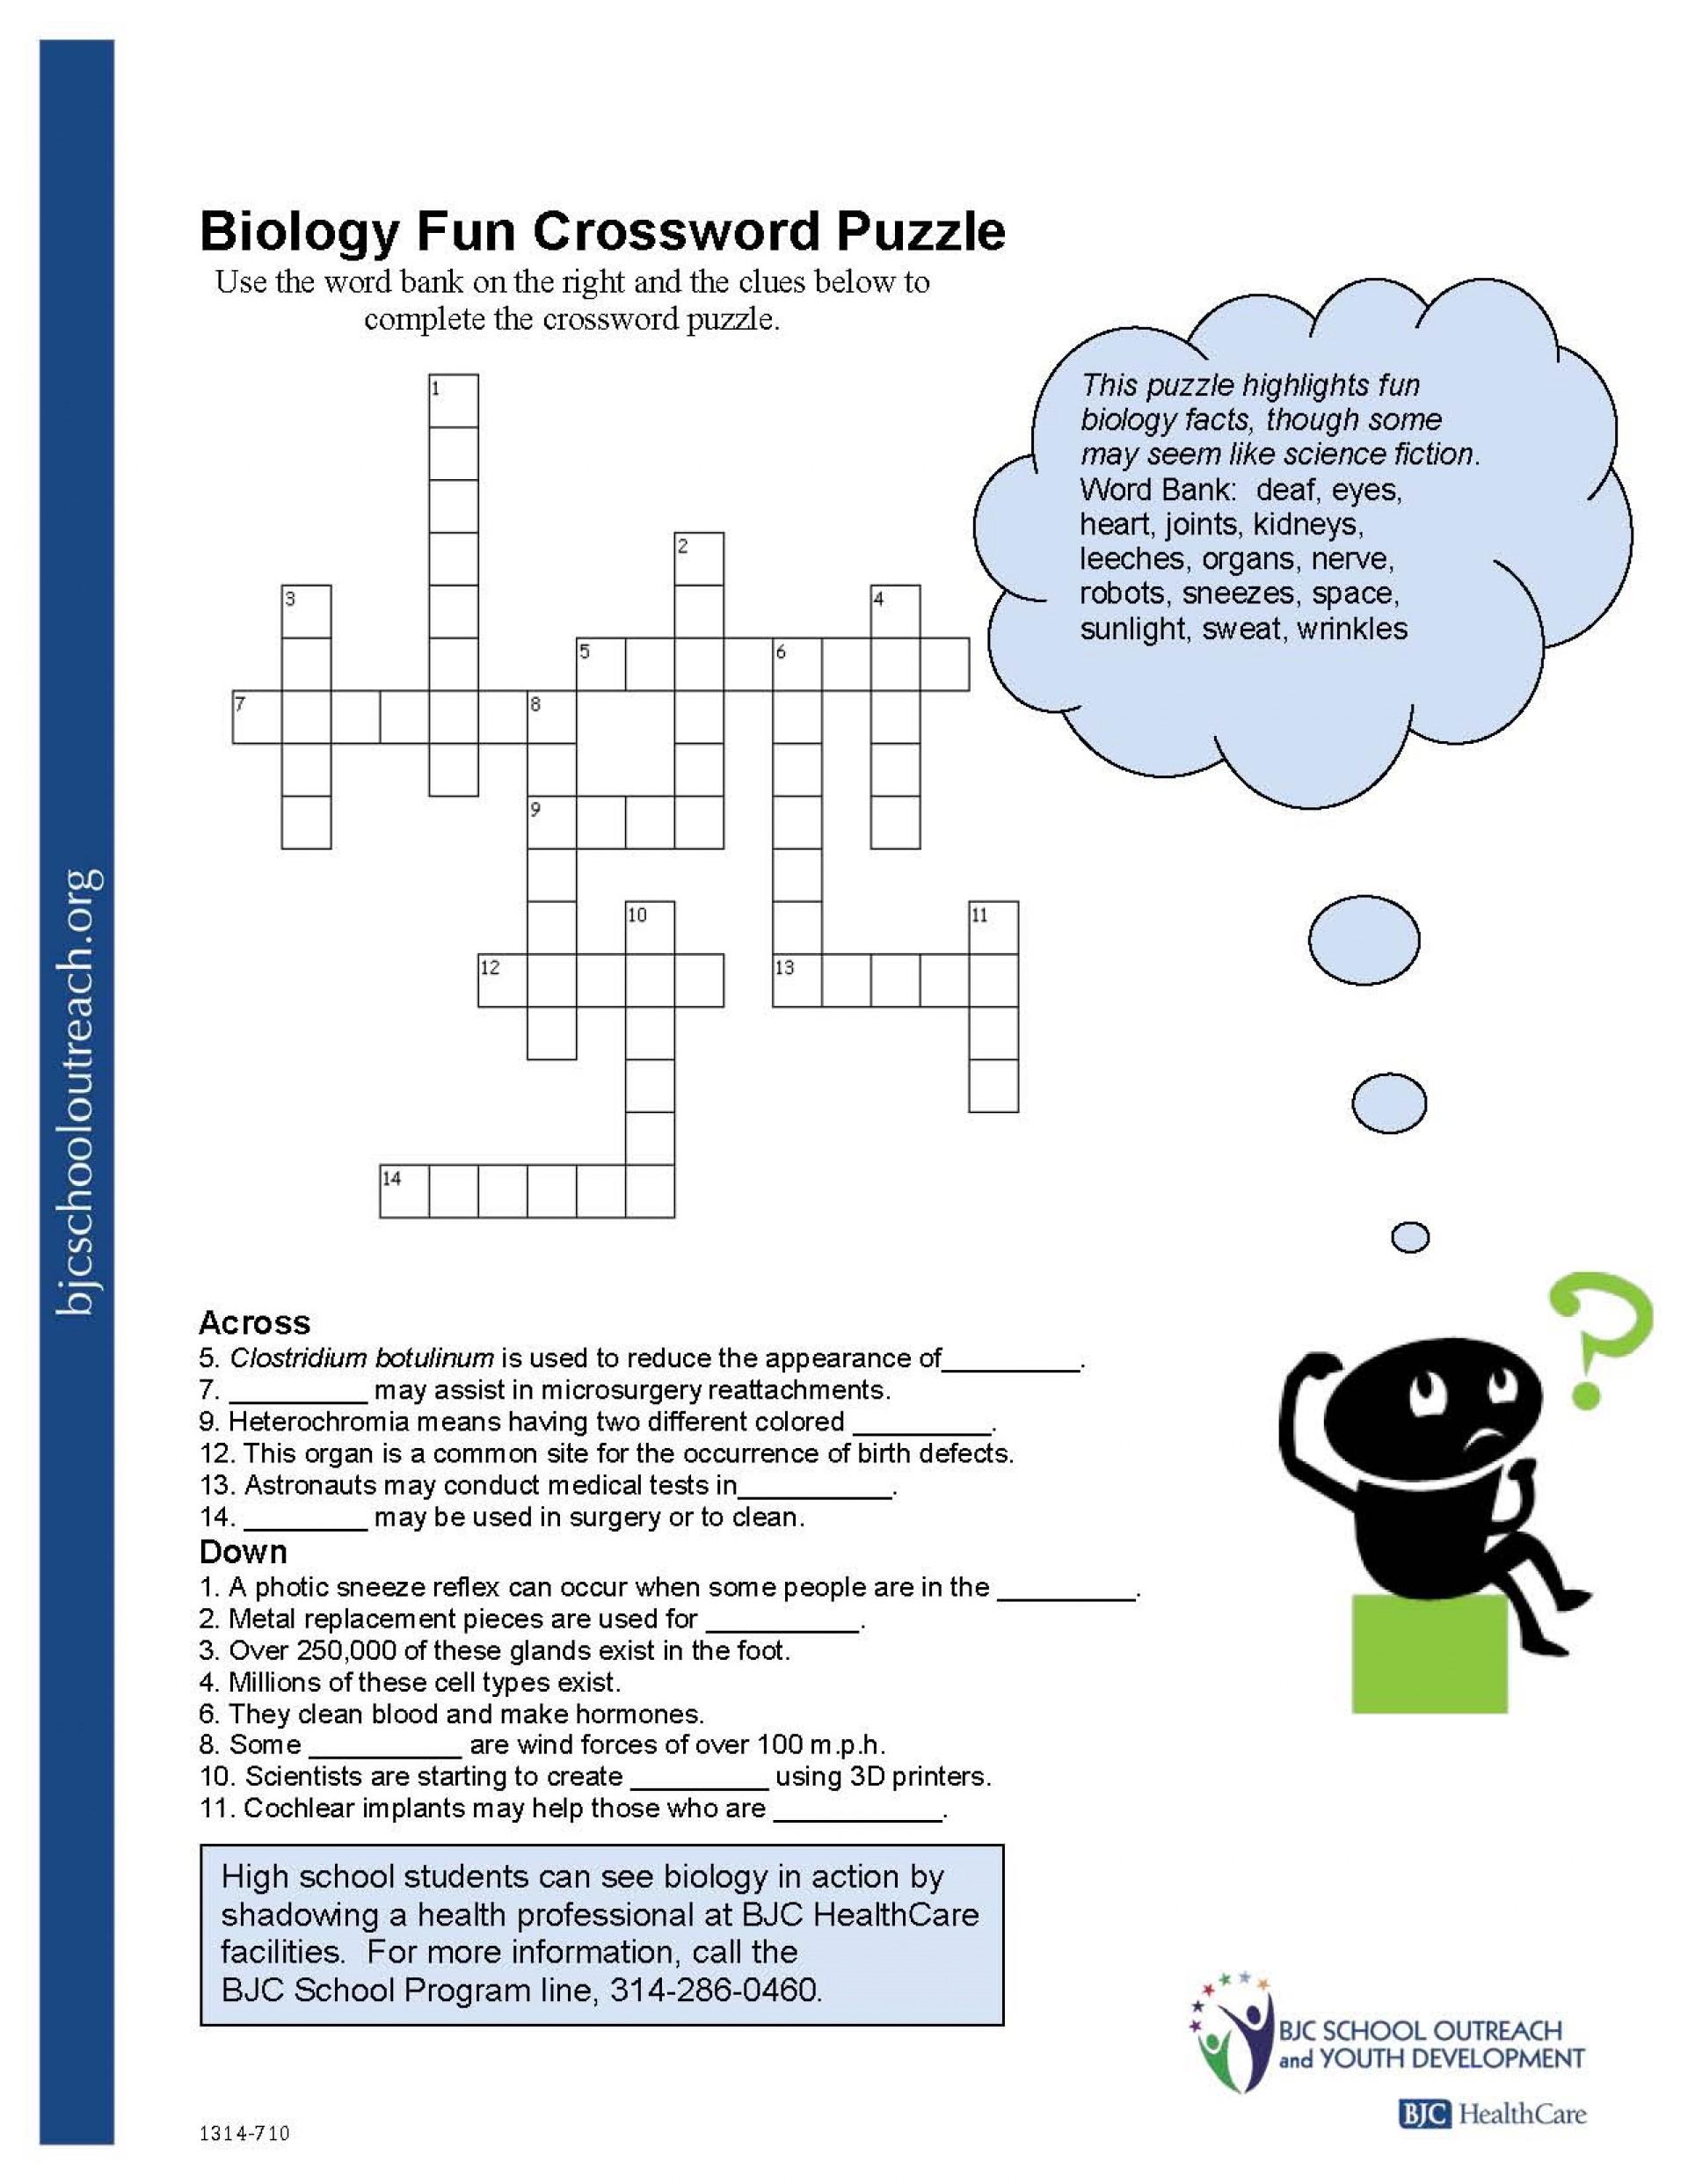 Crosswords Crossword Puzzle Worksheets For Middle School Biology Fun - Free Printable Crossword Puzzles Robotics